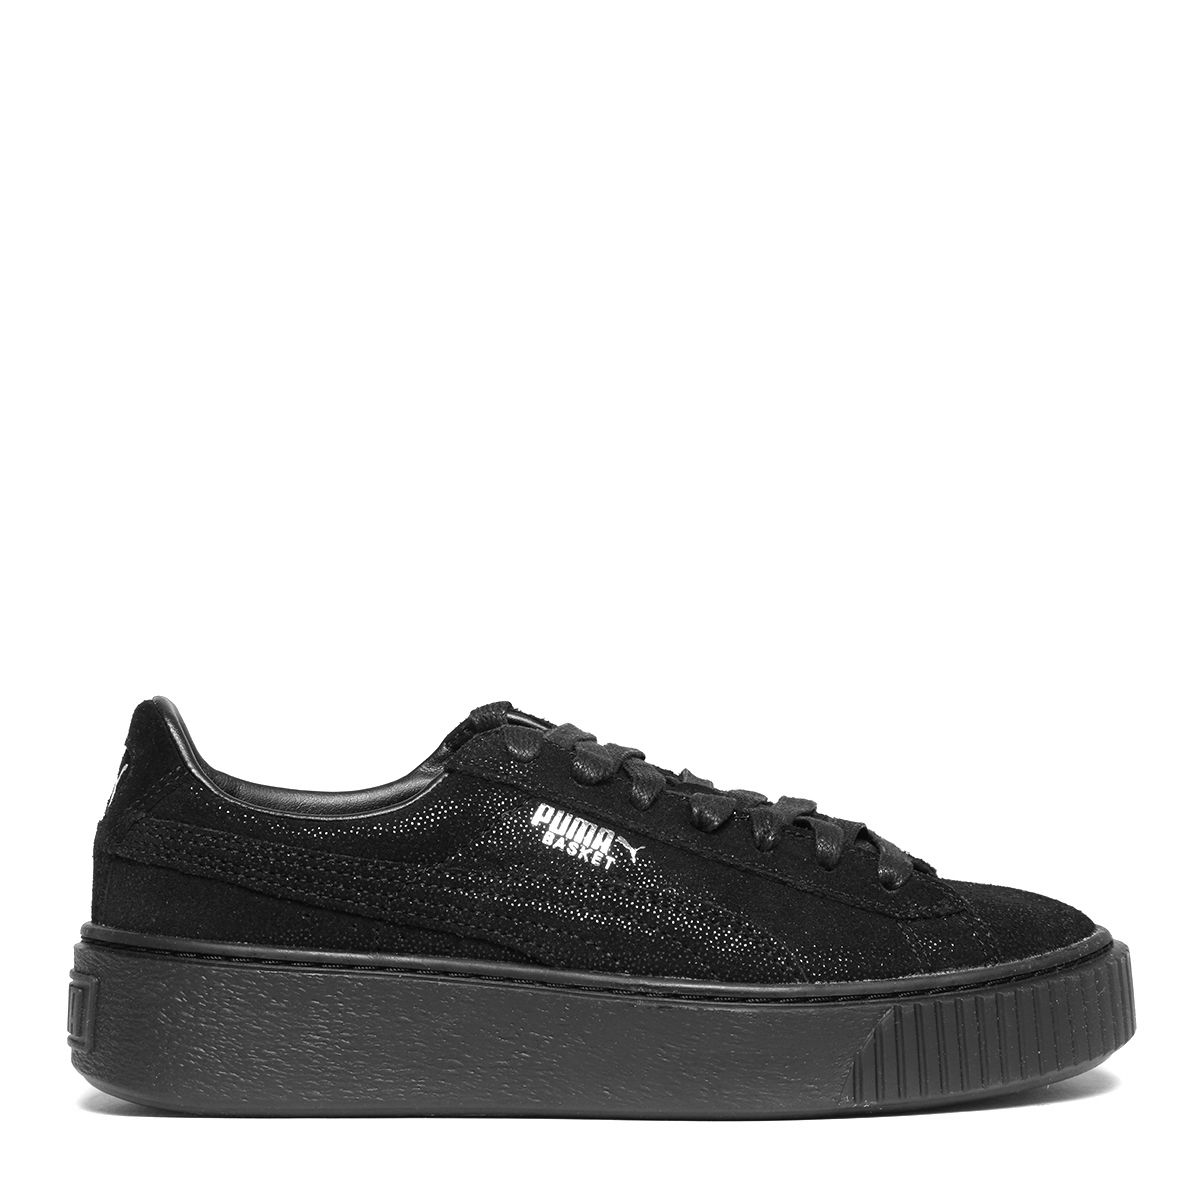 Puma Basket Platform Reset Sneakers